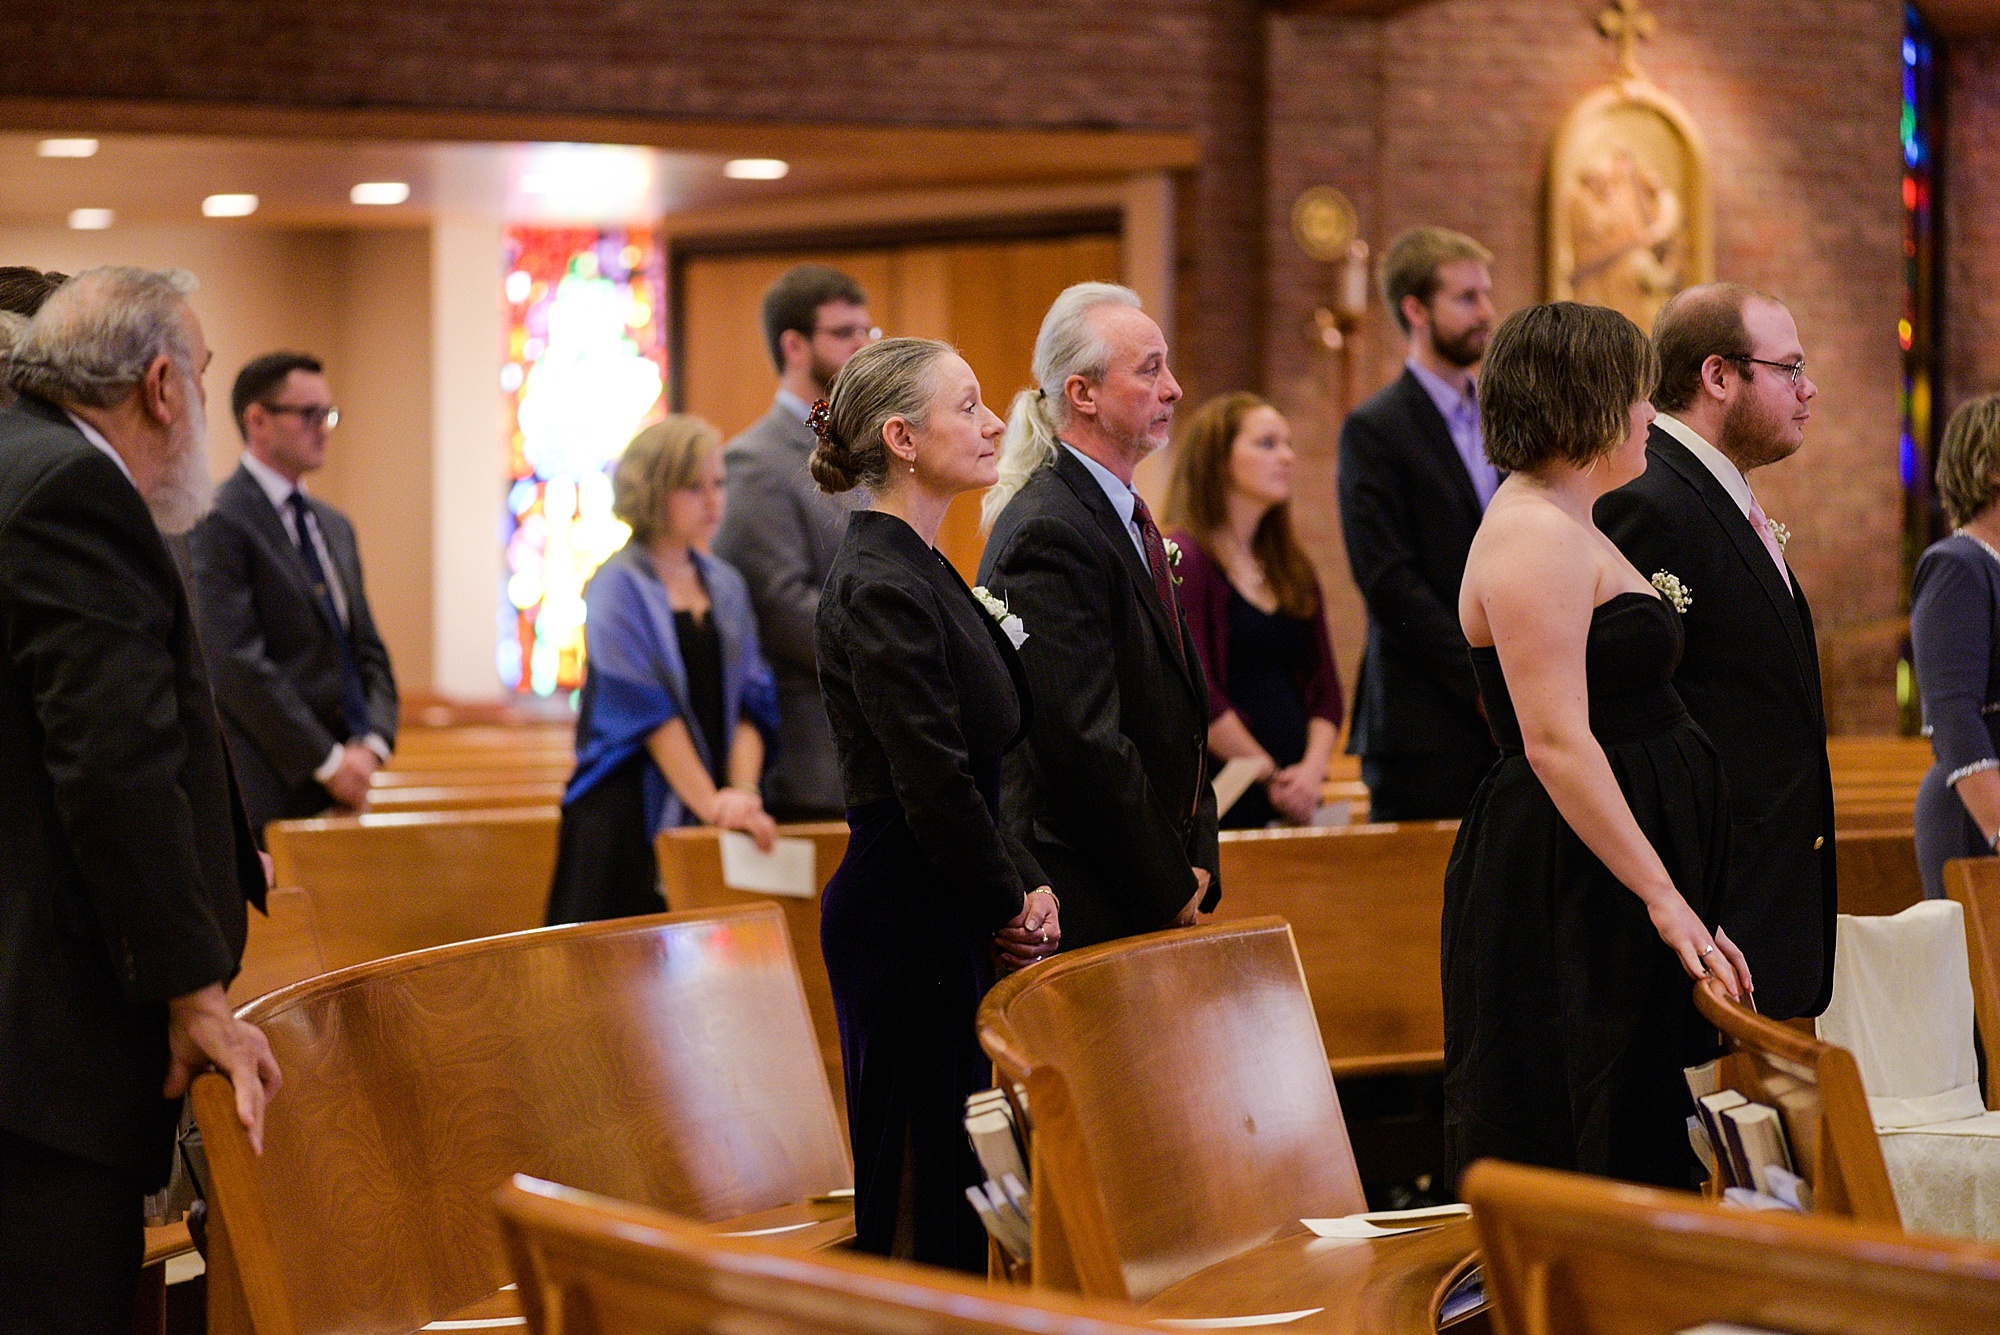 fredericksburg-wedding-church-mercantile_0020.jpg